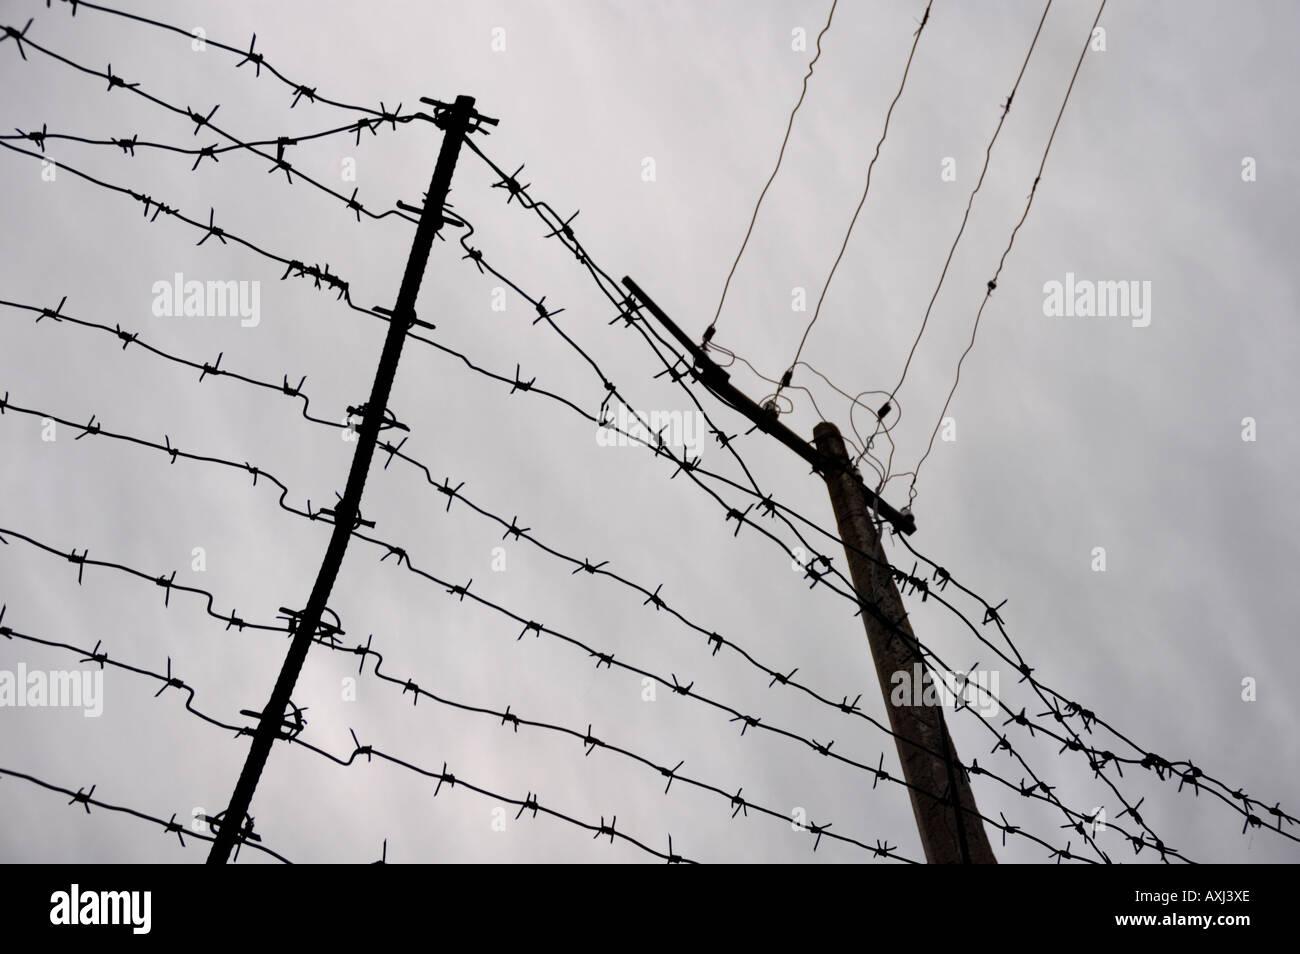 Nice Concertina Wire Vietnam Photo - Electrical System Block Diagram ...